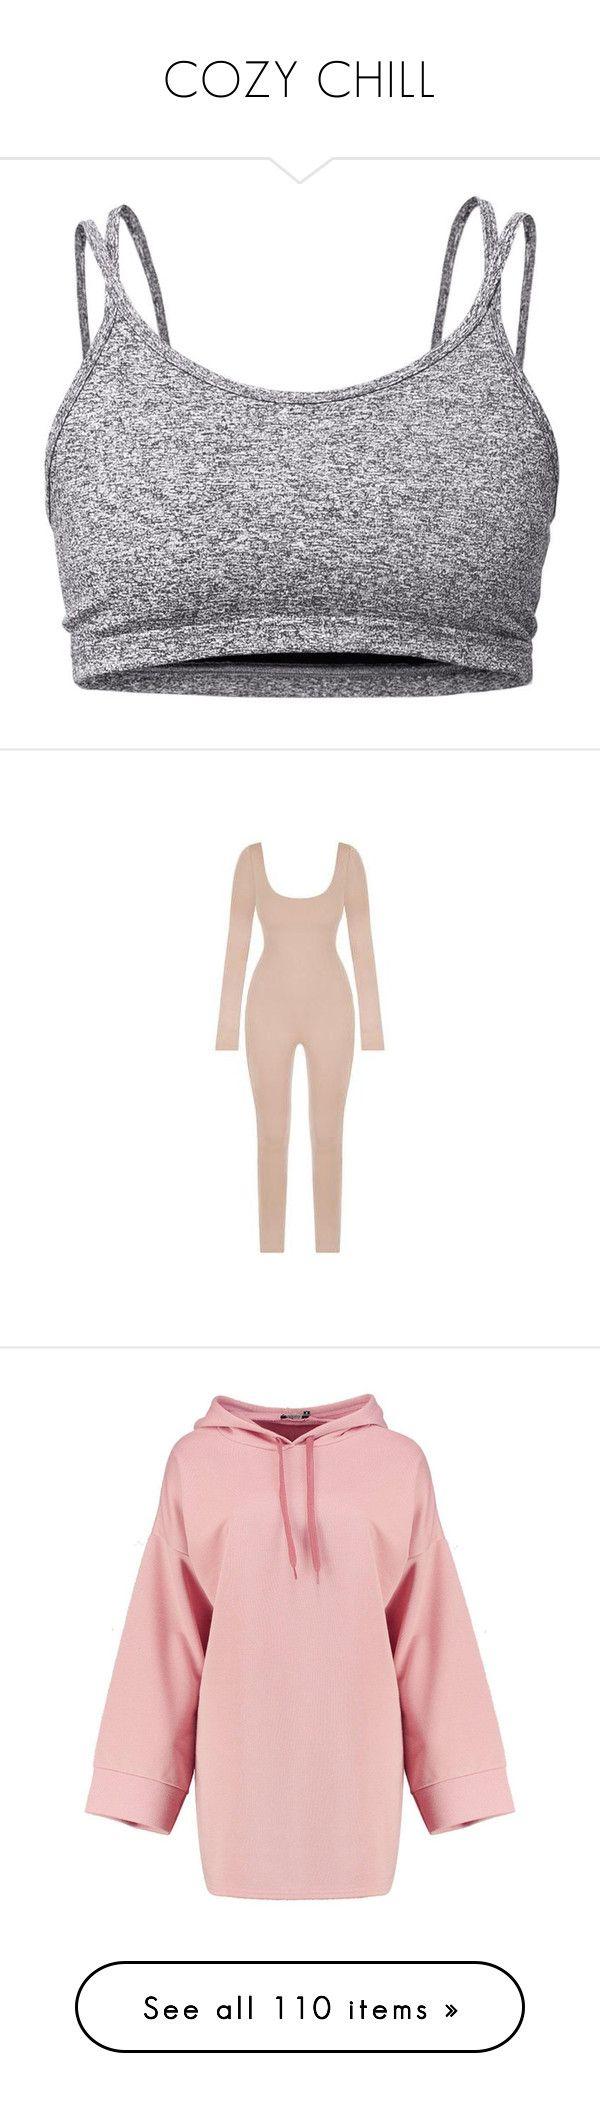 """COZY CHILL"" by neide-goncalvesbrito on Polyvore featuring activewear, activewear pants, pants, bottoms, sweatpants, jeans, men, grey sweat pants, cotton sweat pants et drawstring sweatpants"